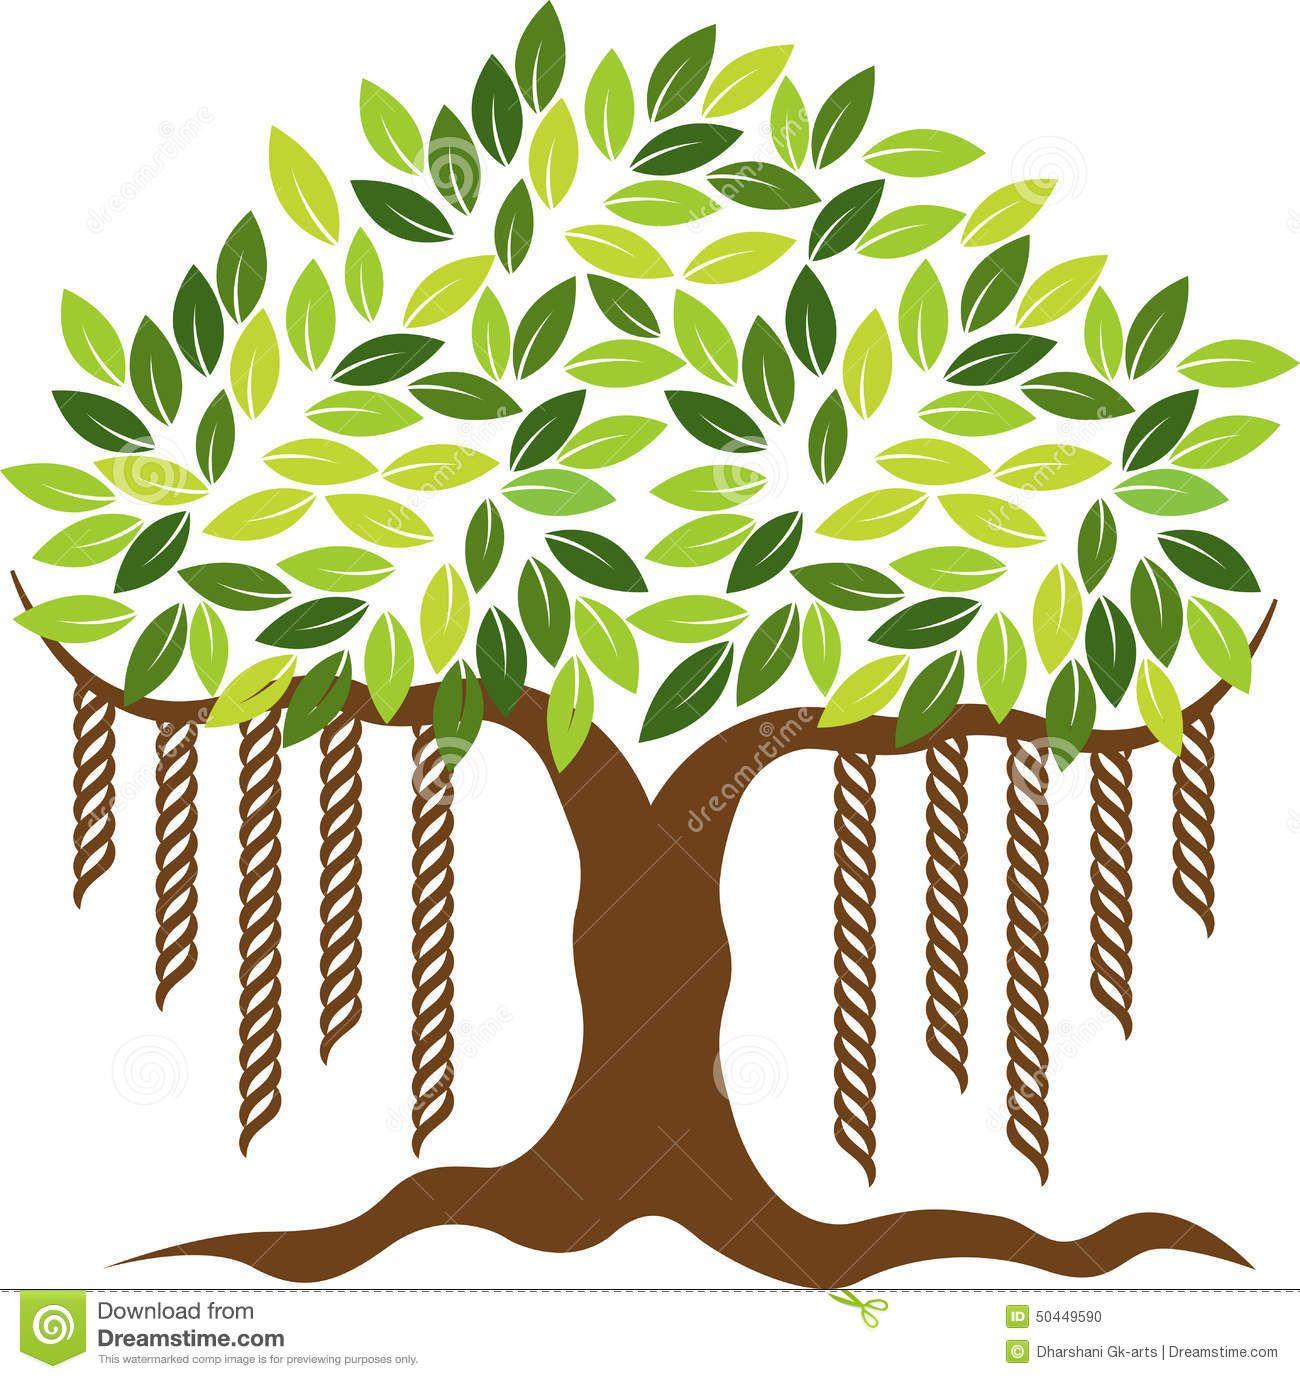 banyan tree illustration - Google Search | Banyan tree ...